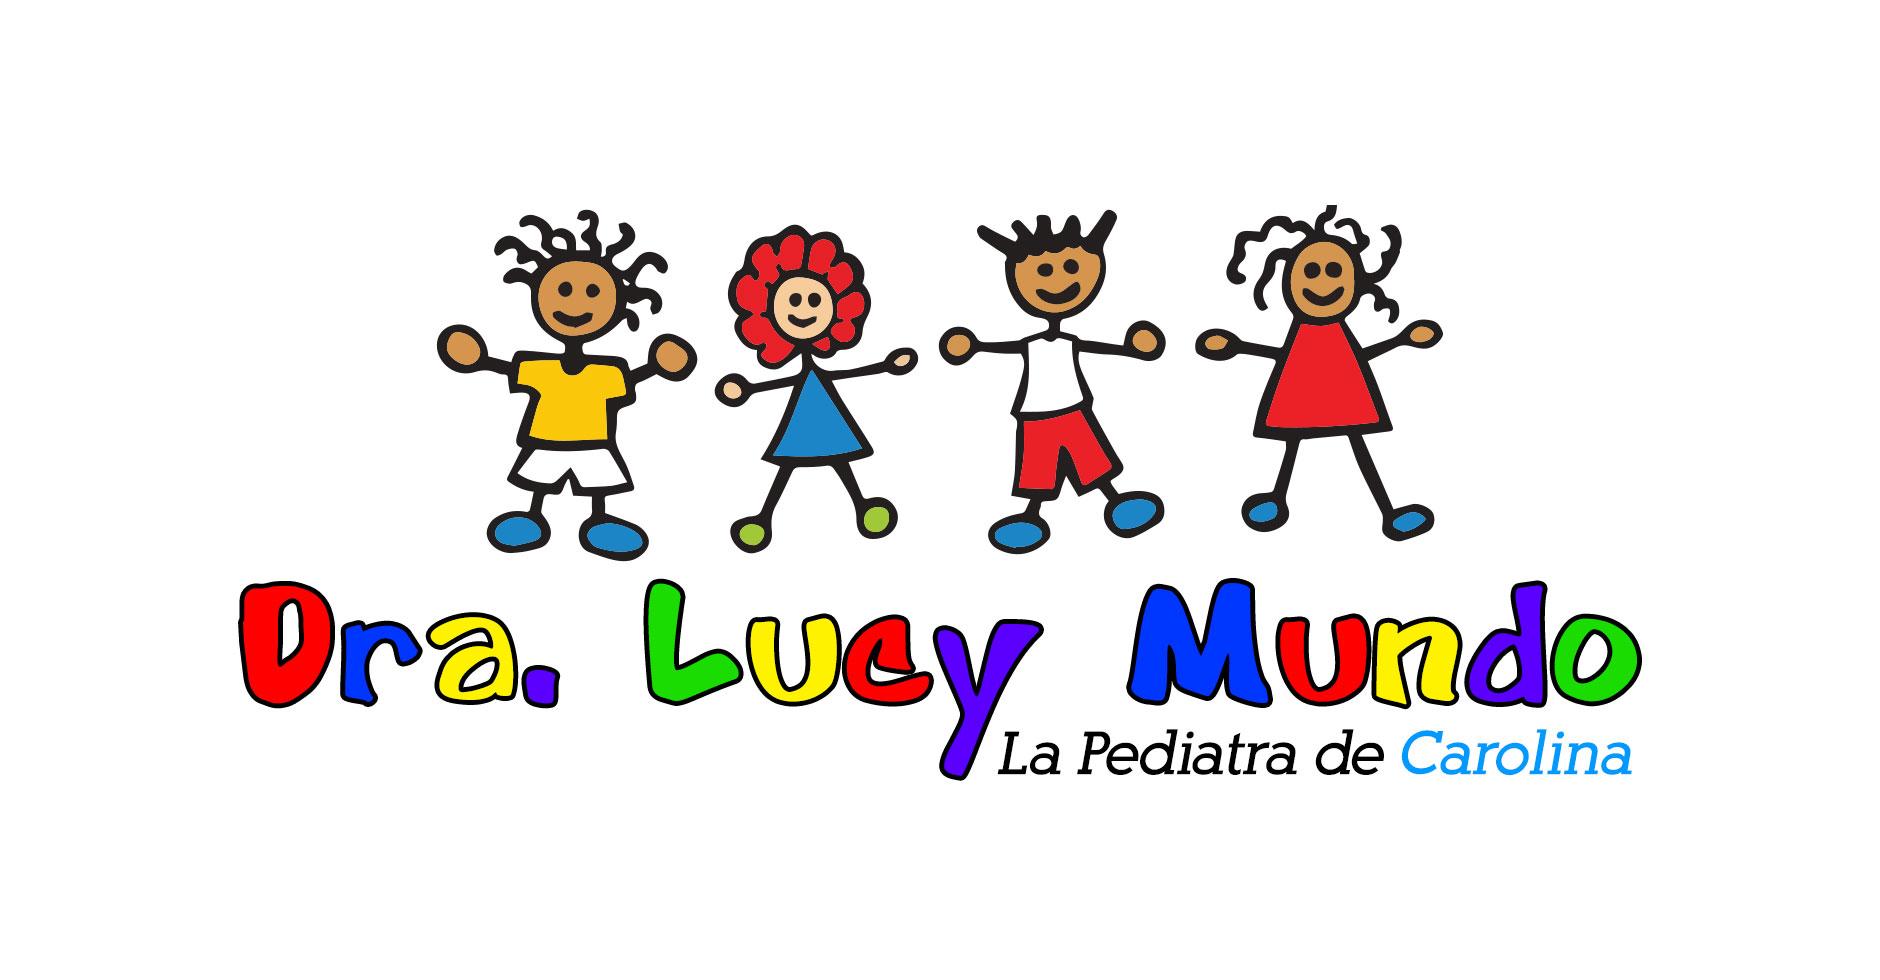 Dra. Lucy Mundo, la Pediatra de Carolina.